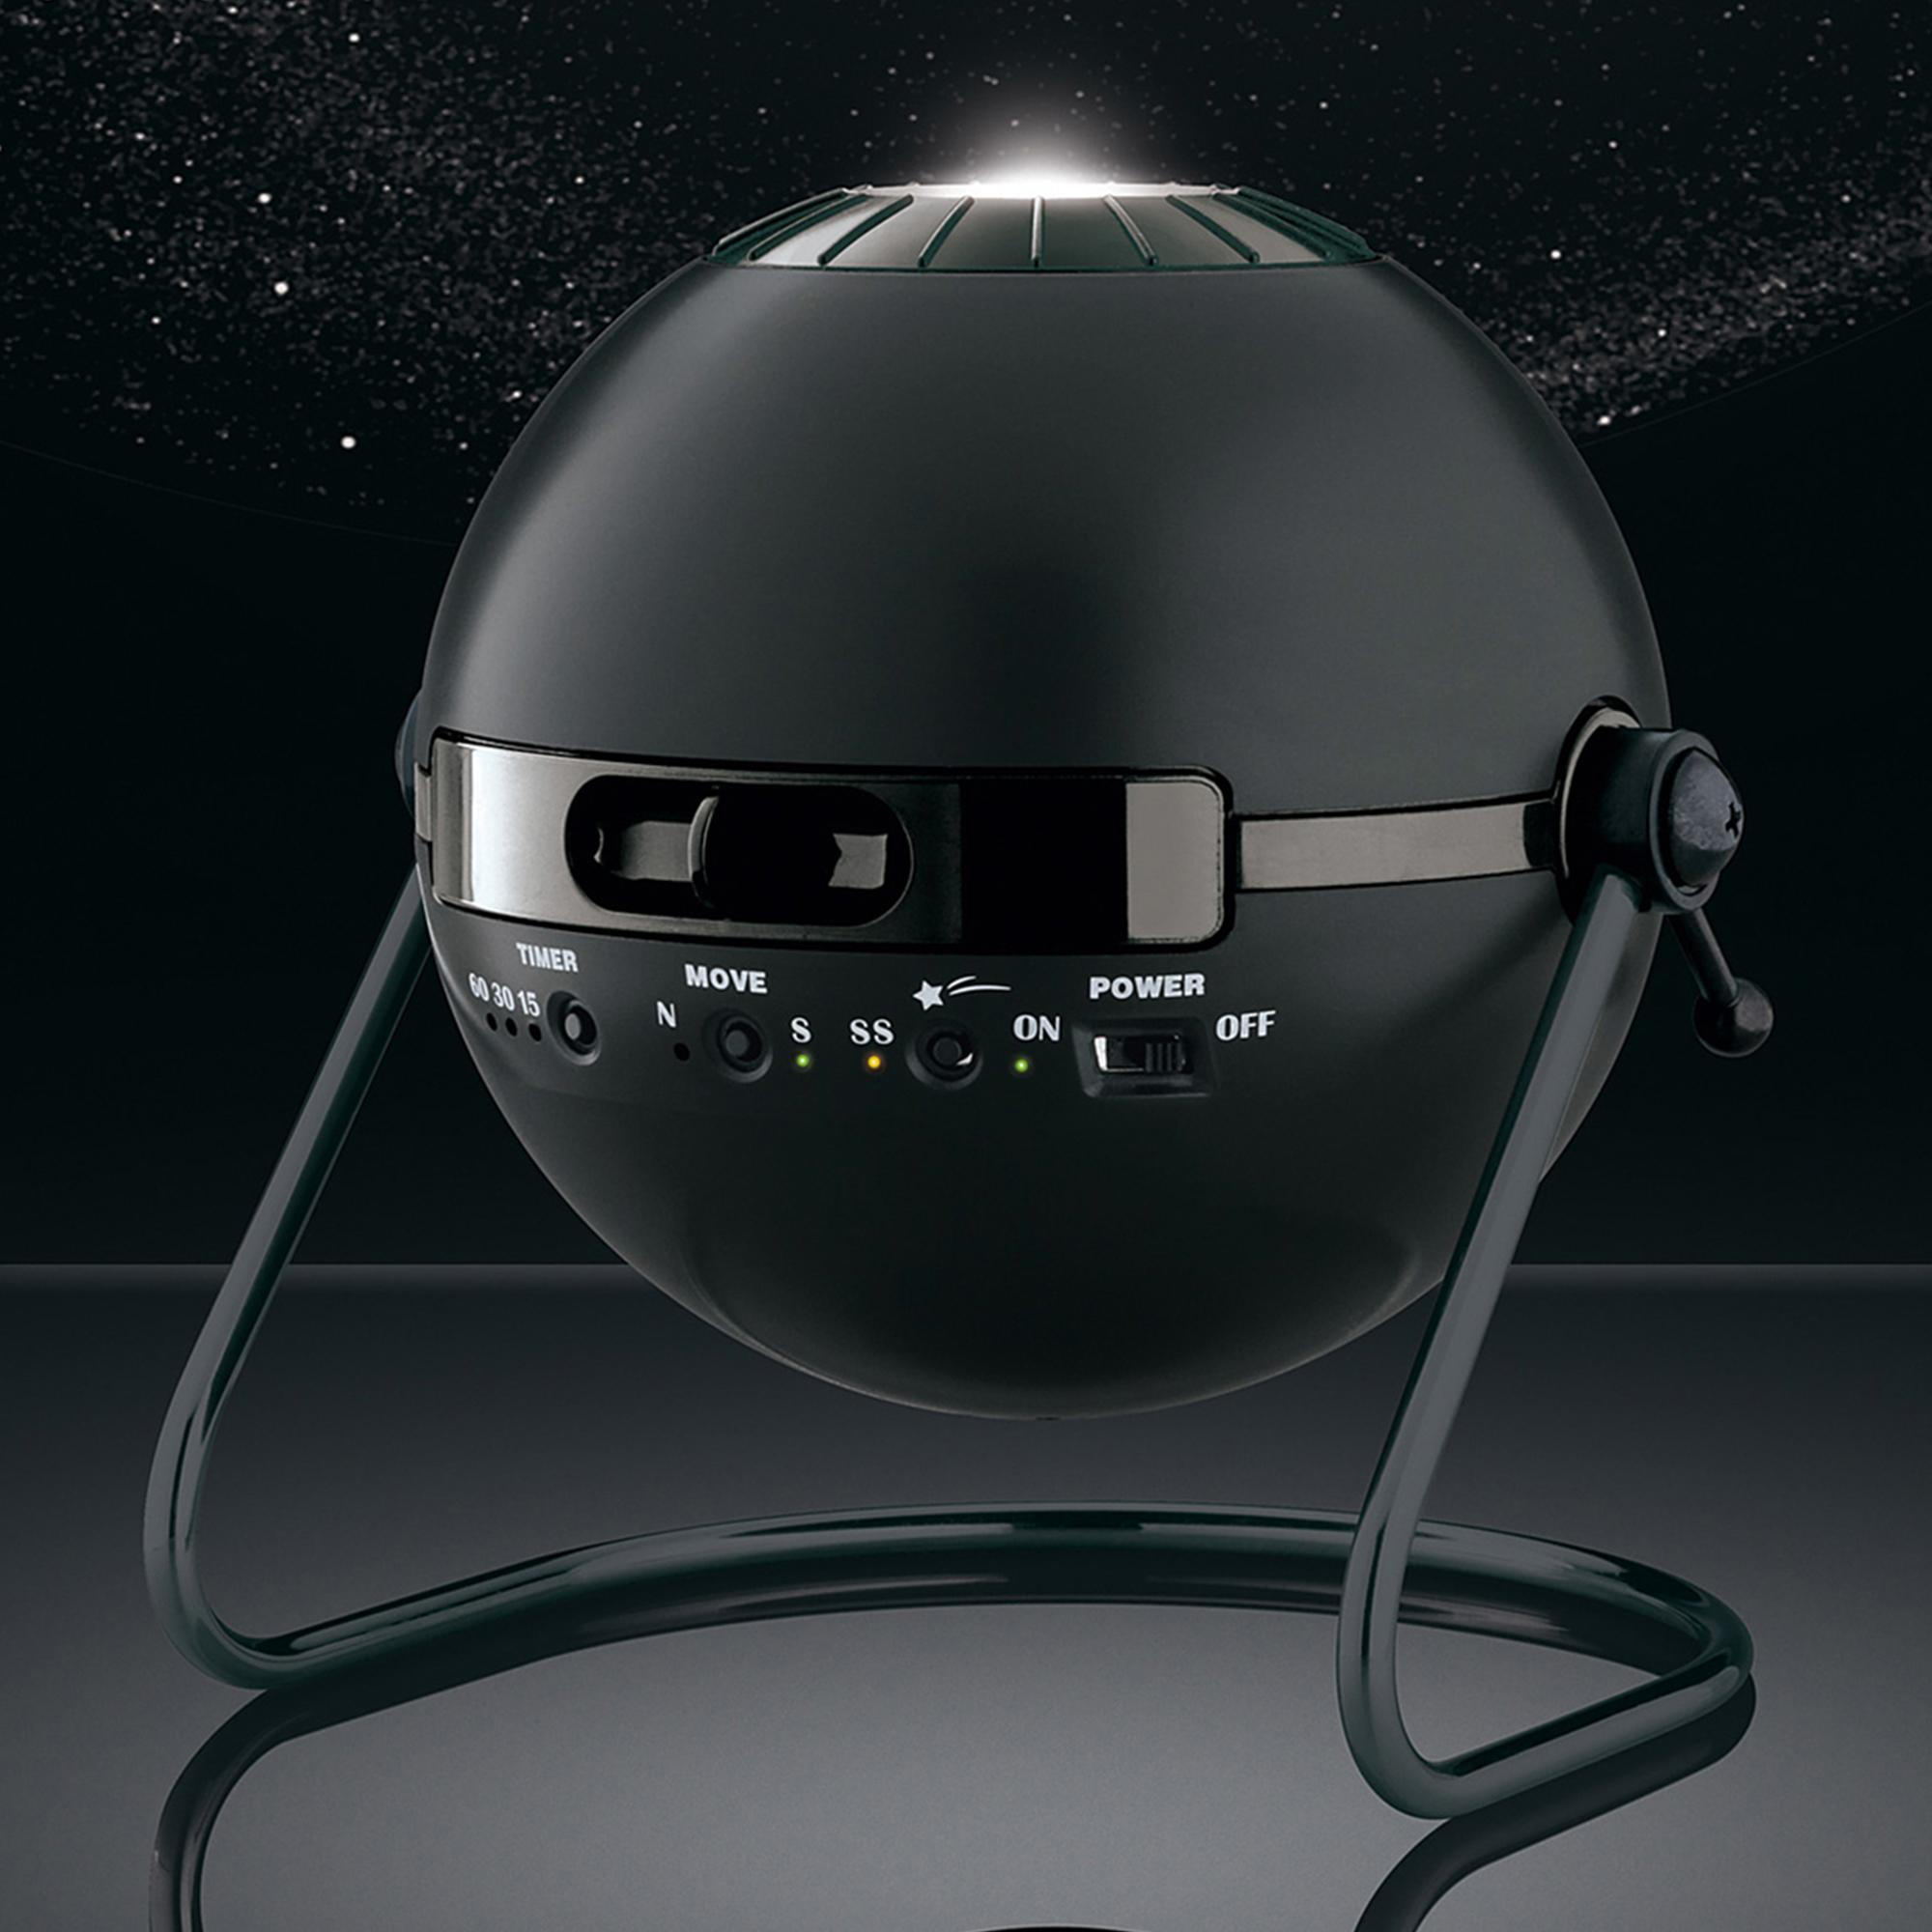 Sega Toys Planetarium - Sternenhimmel Projektor für zuhause